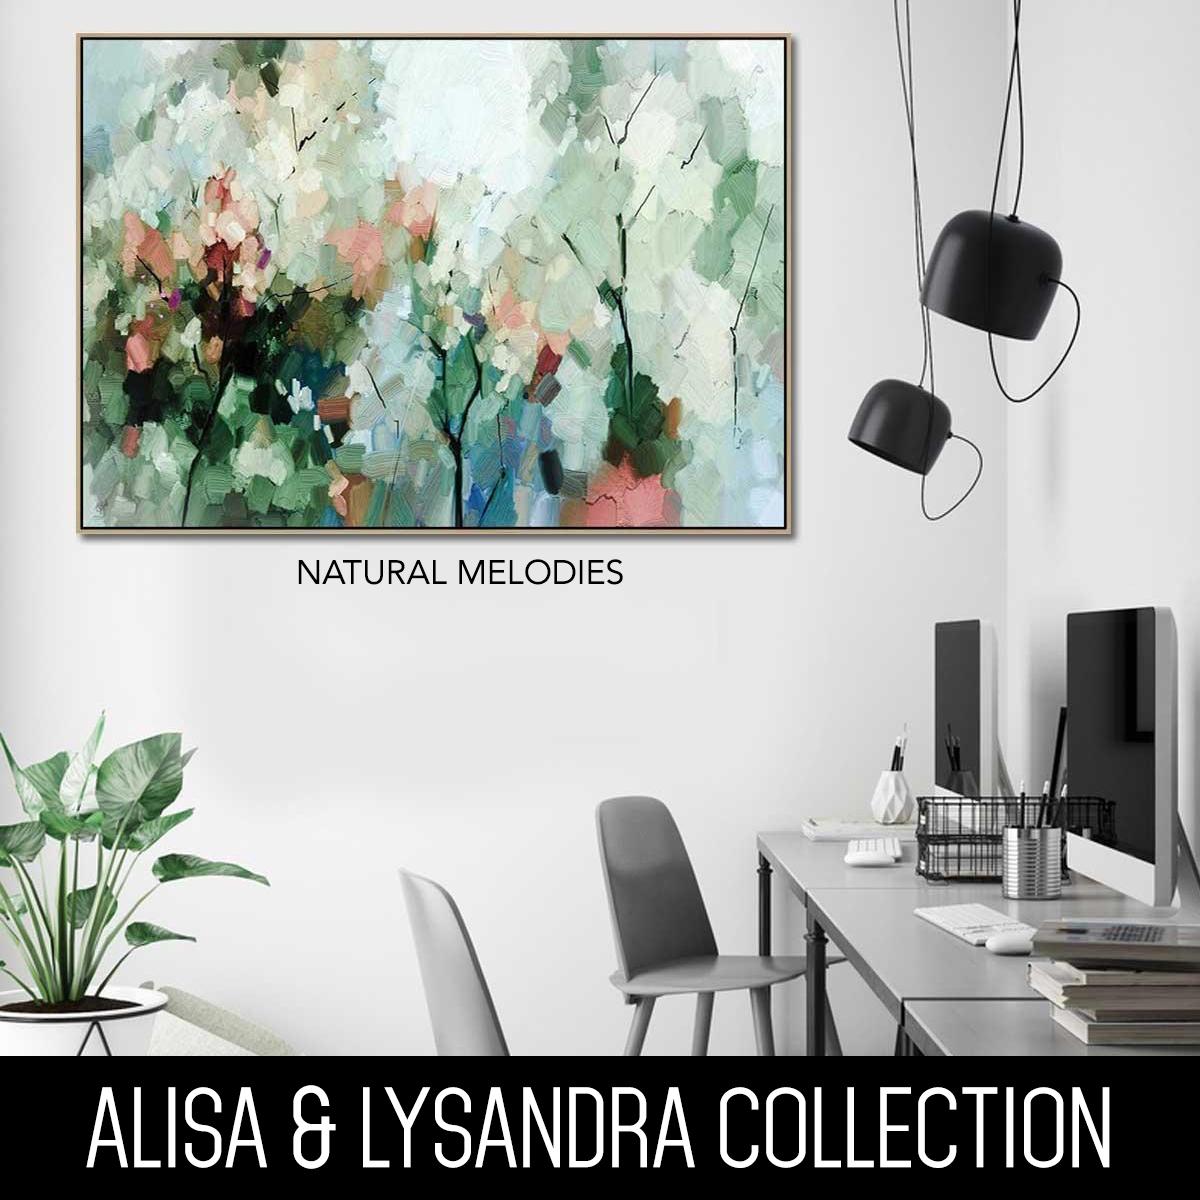 ALISA & LYSANDRA PAINTINGS